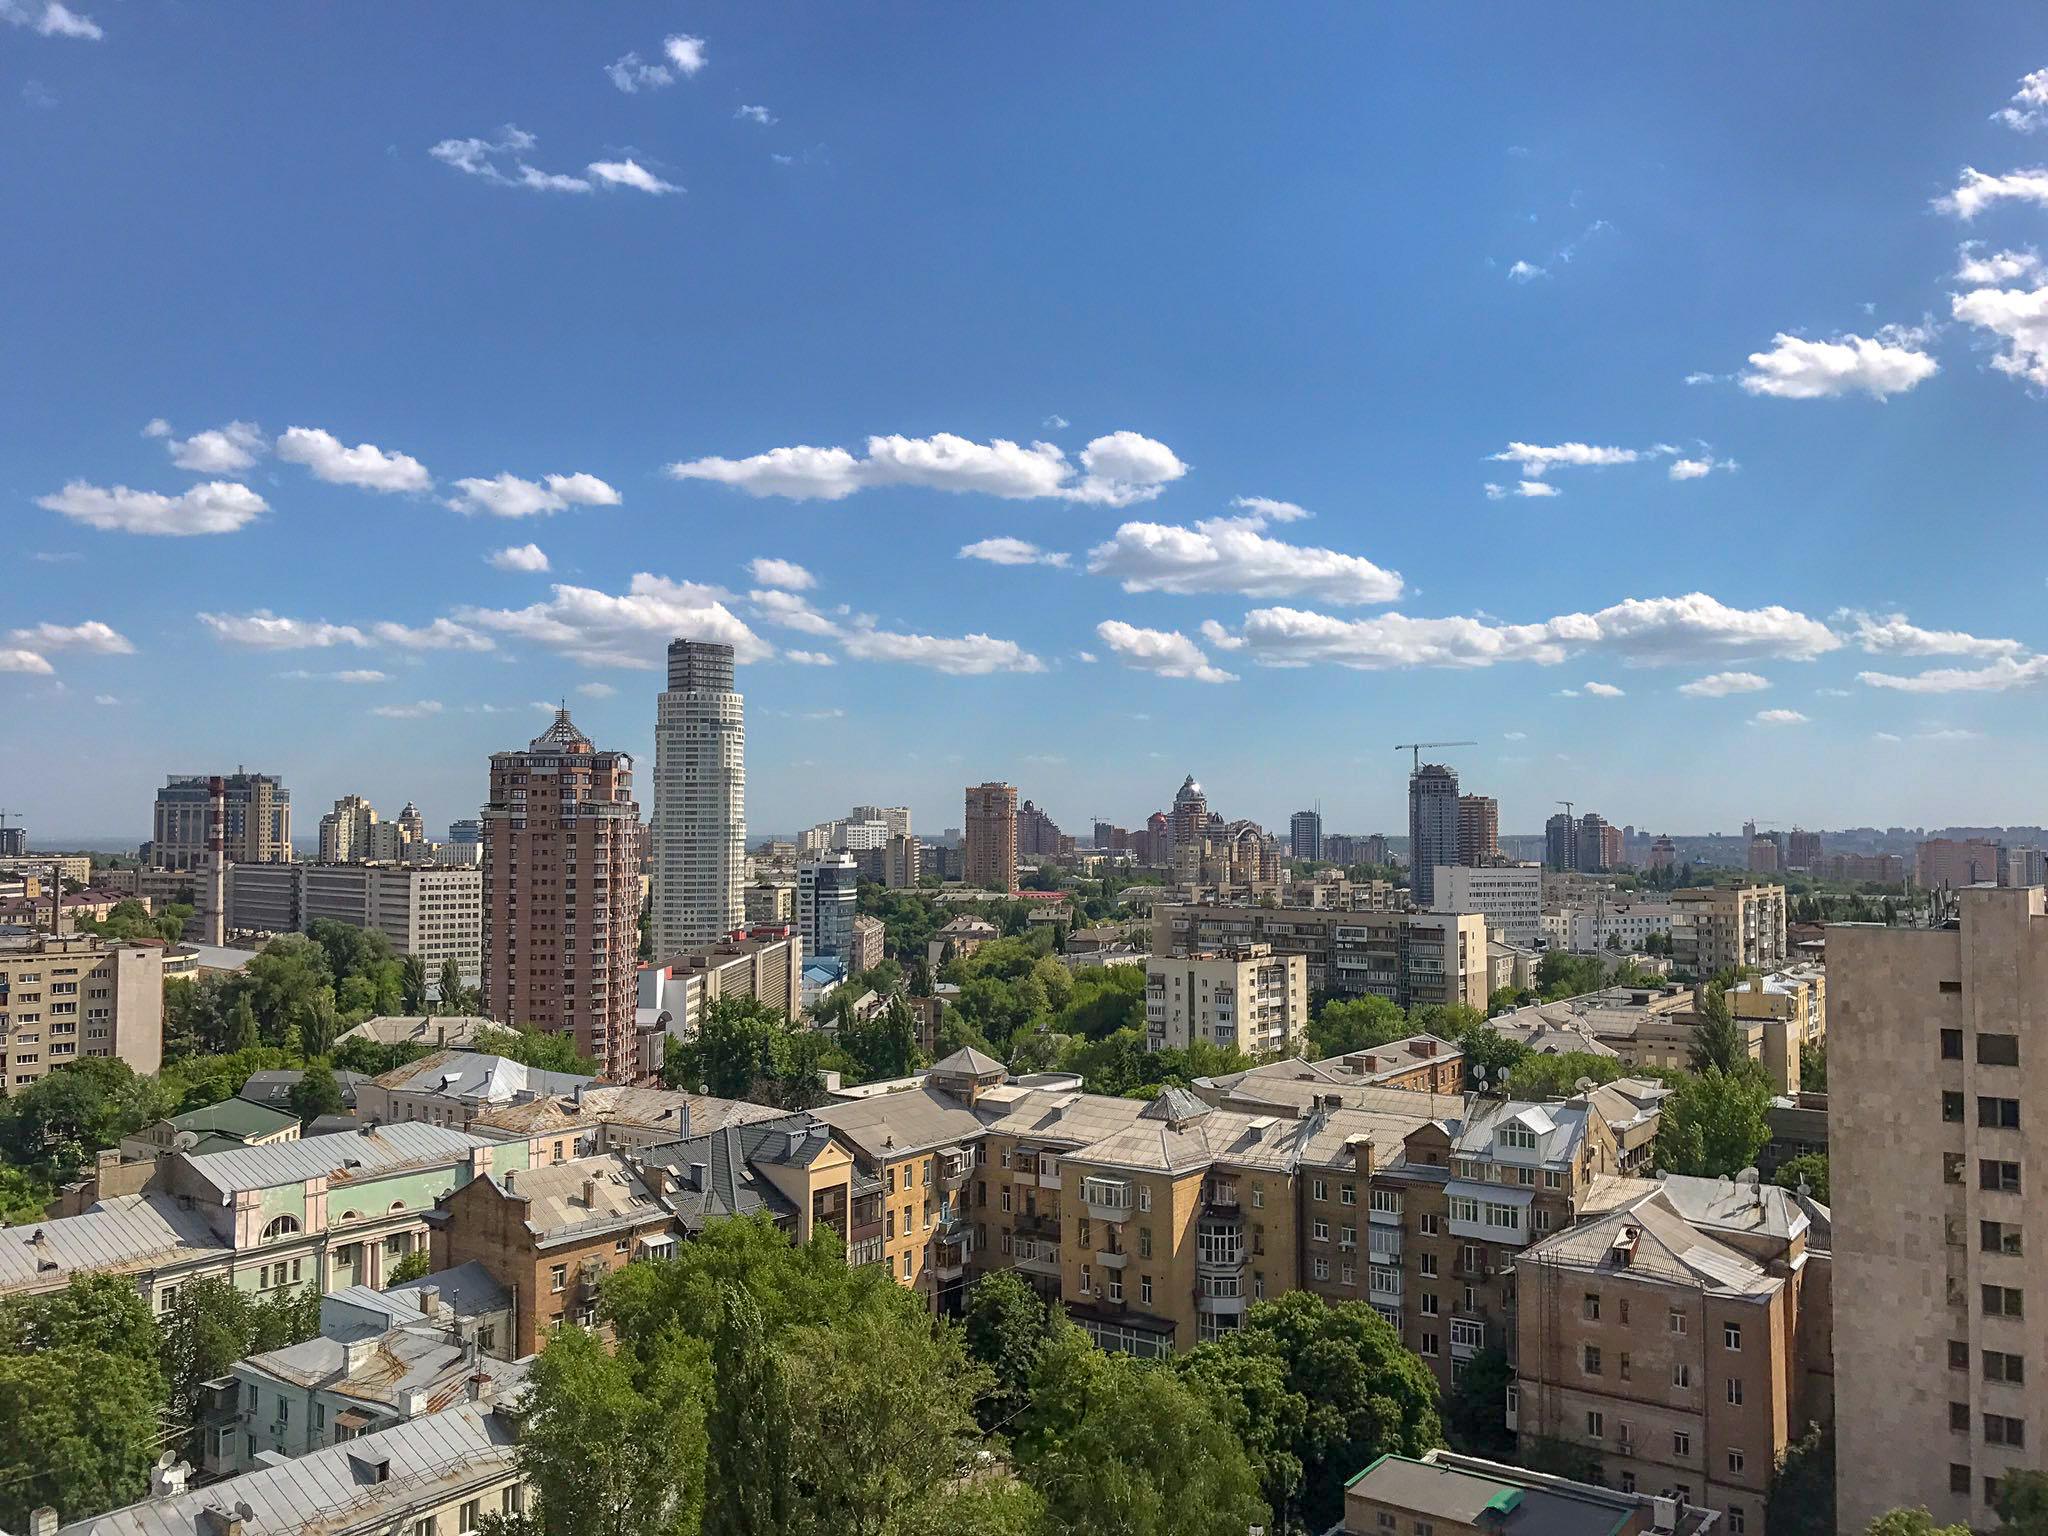 The vast, sprawling Kiev skyline basks in the sunshine.